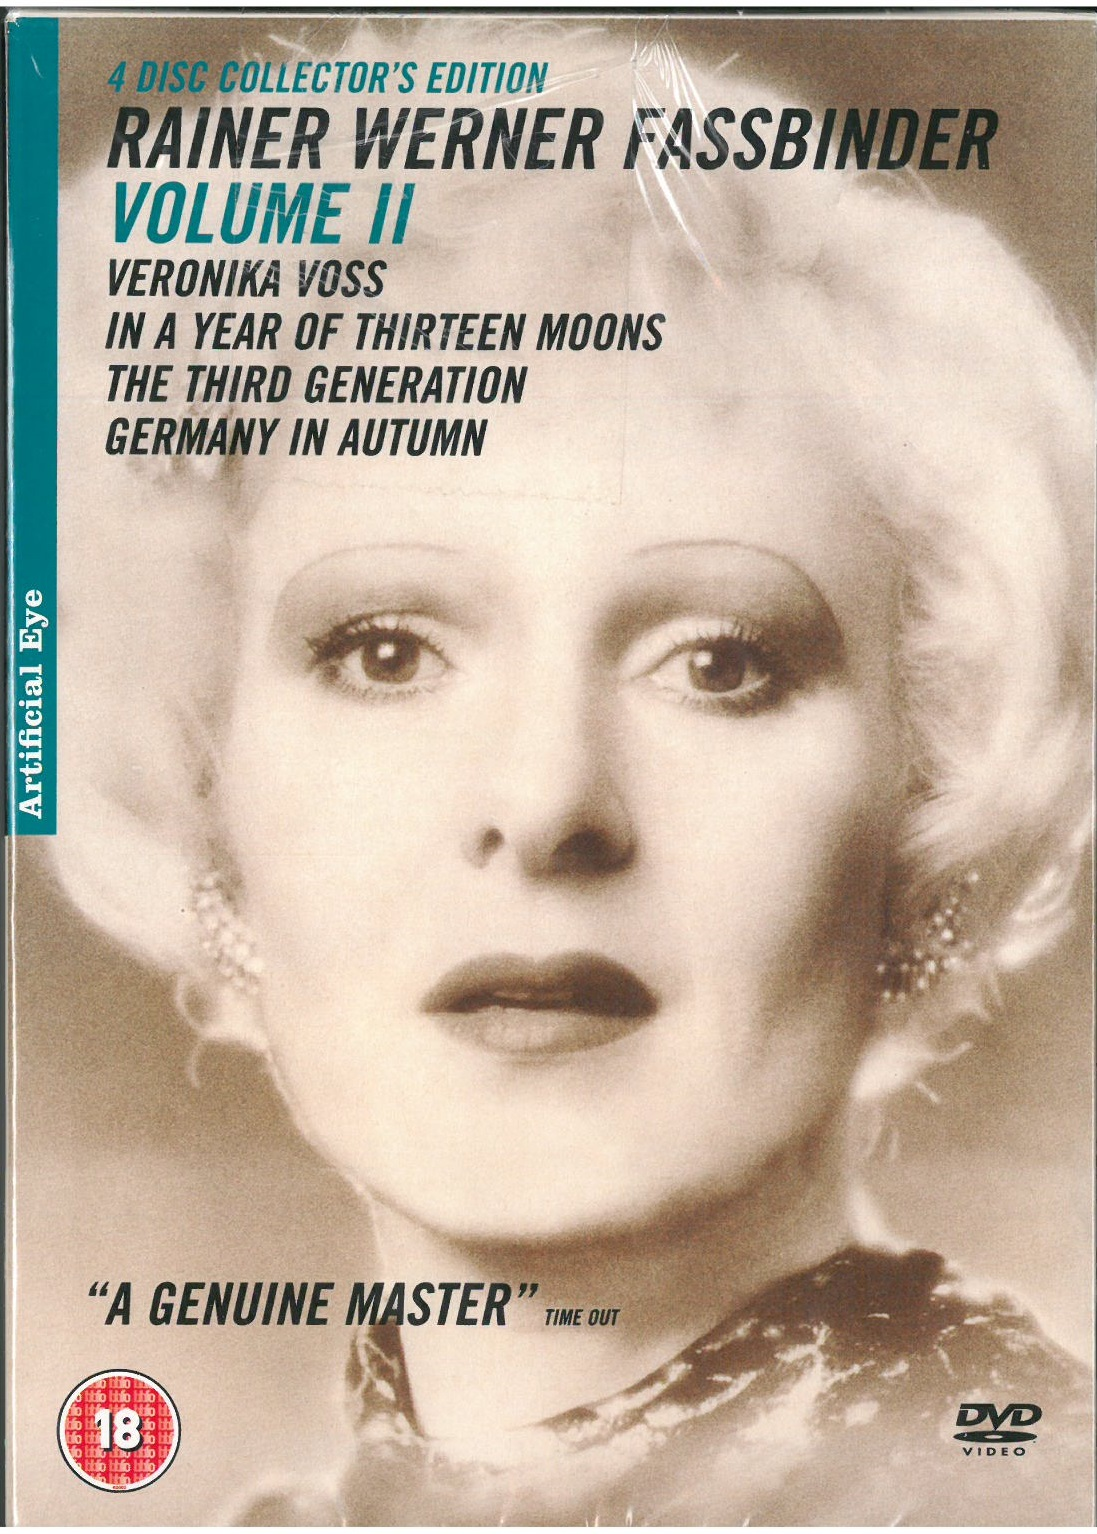 Buy Rainer Werner Fassbinder: Volume 2